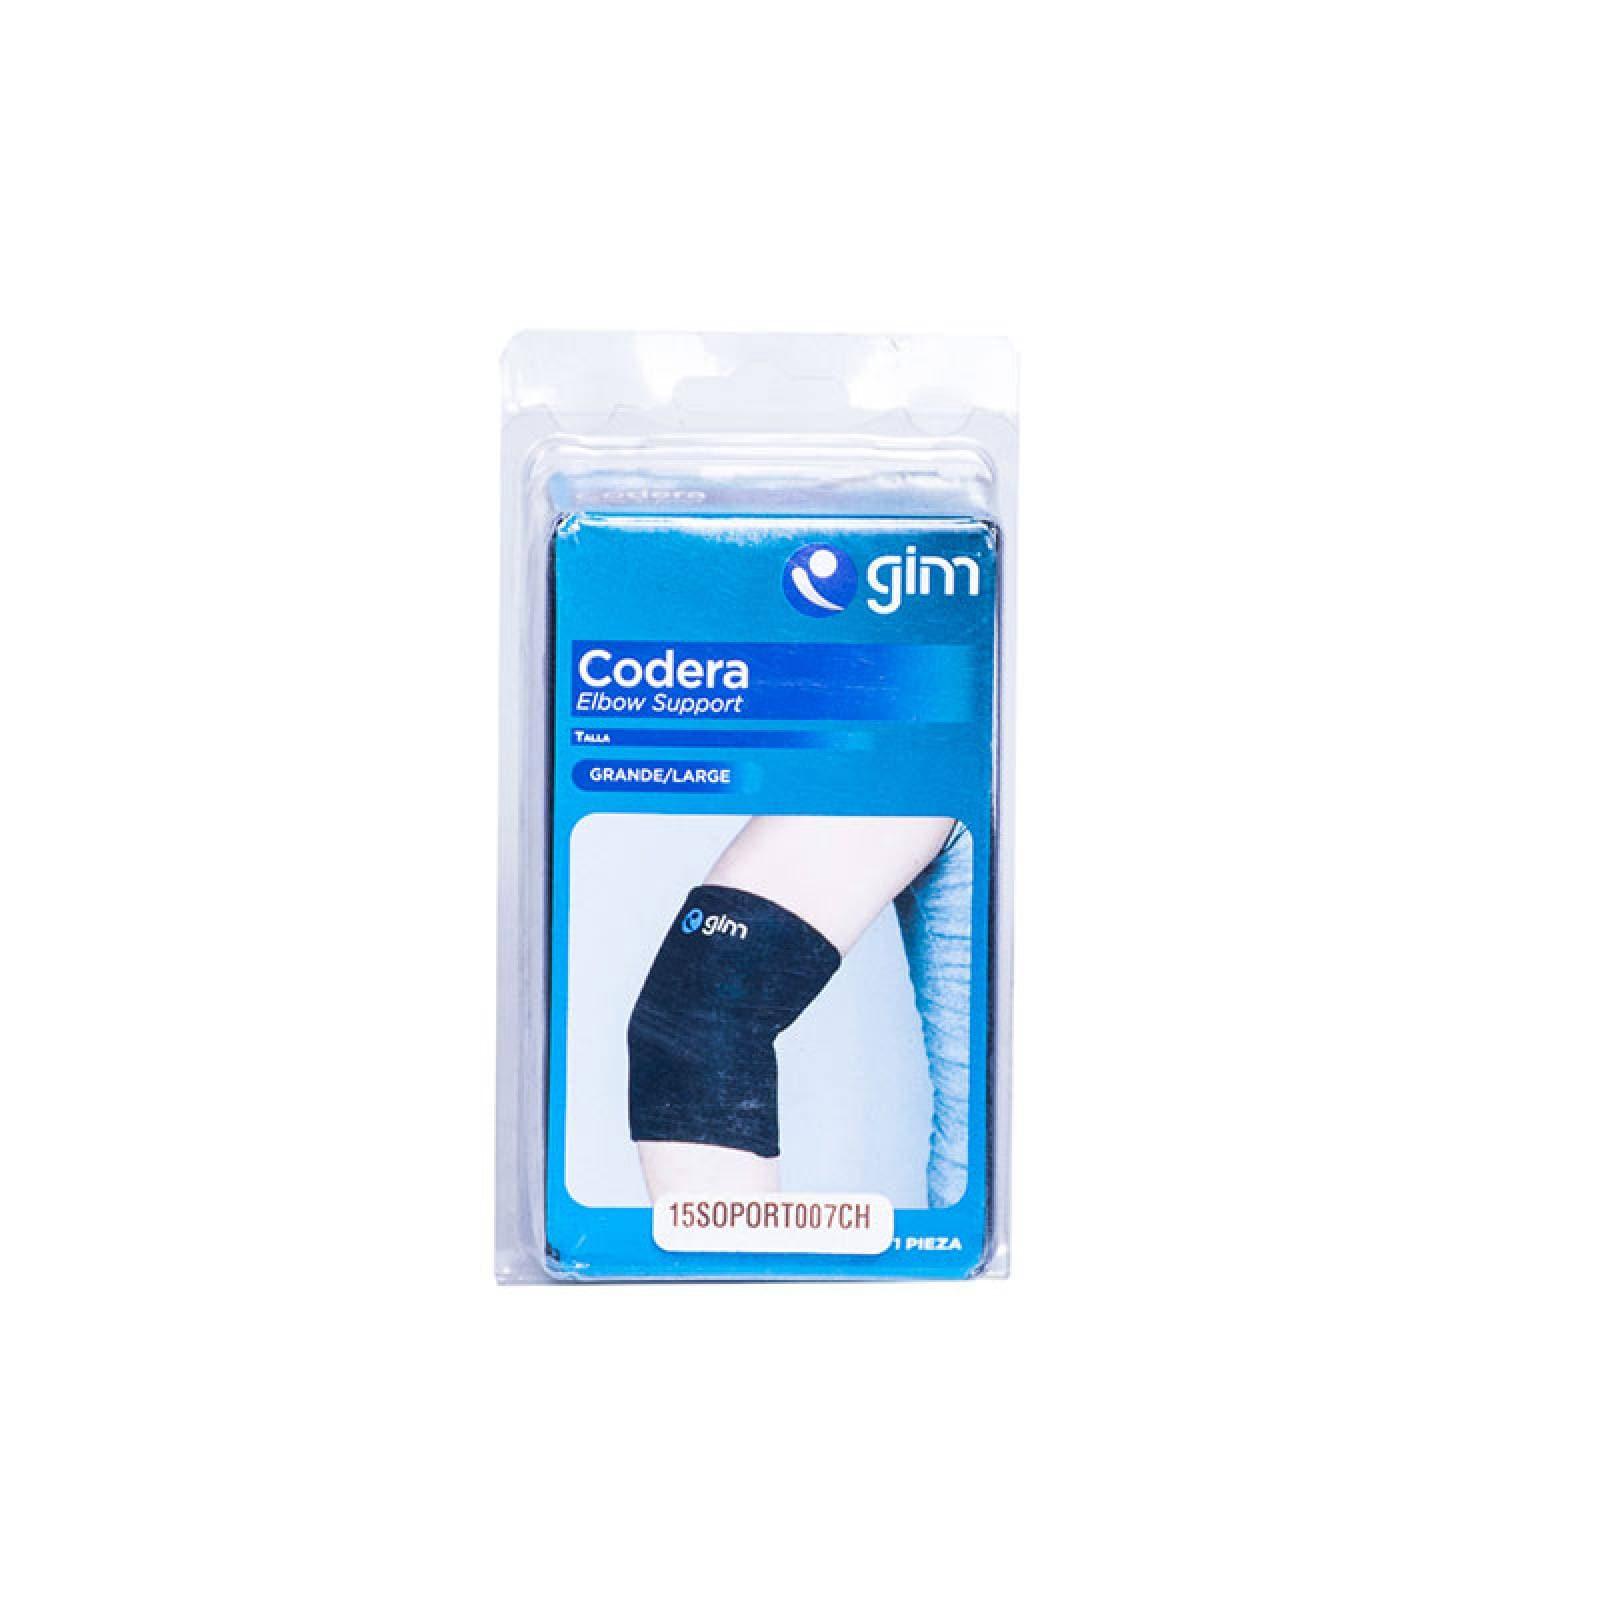 Codera Elastica Grande Velcro Nylon Neopreno Negro Gimbel